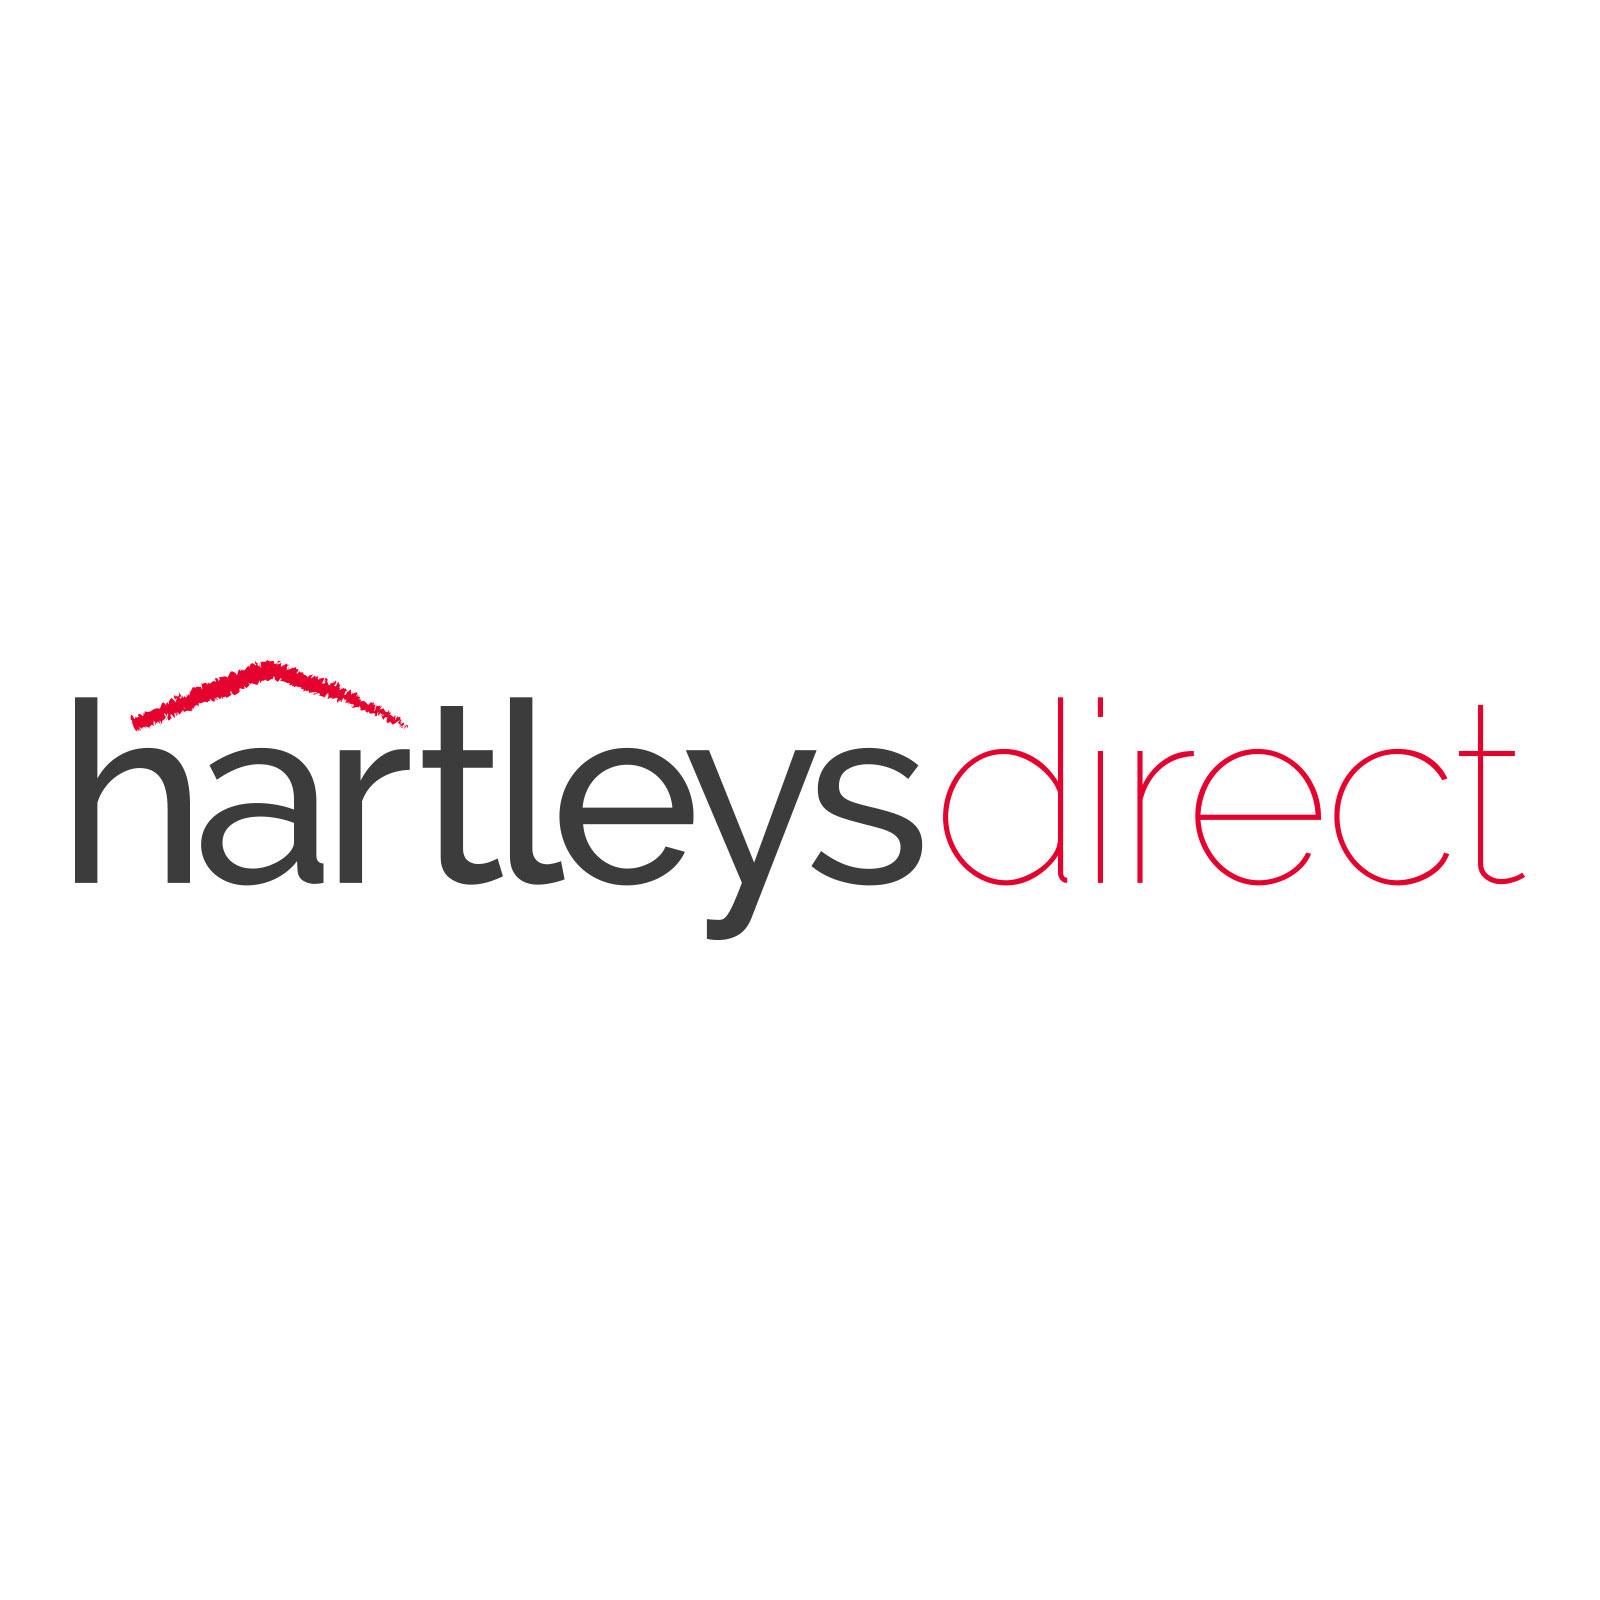 Hartleys-Large-Black-Lockable-Parcel-Mailbox-on-a-White-Background.jpg